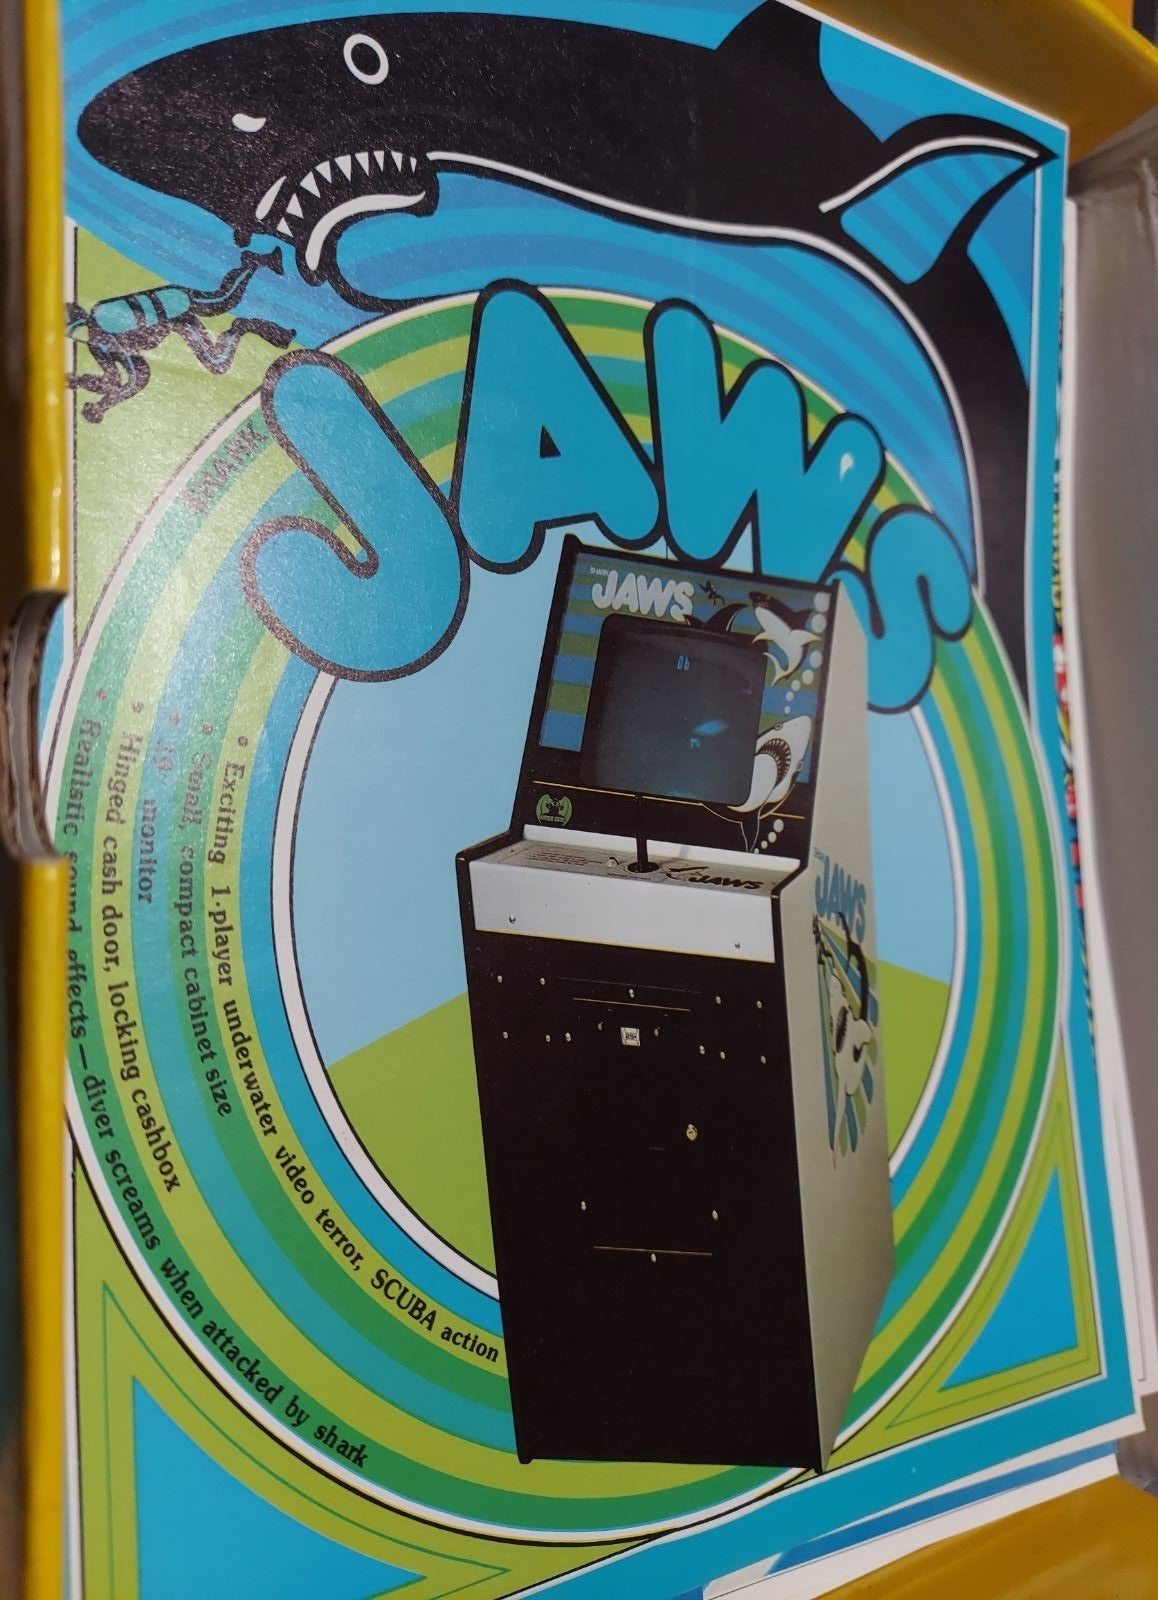 Vintage arcade jaws sales flyer